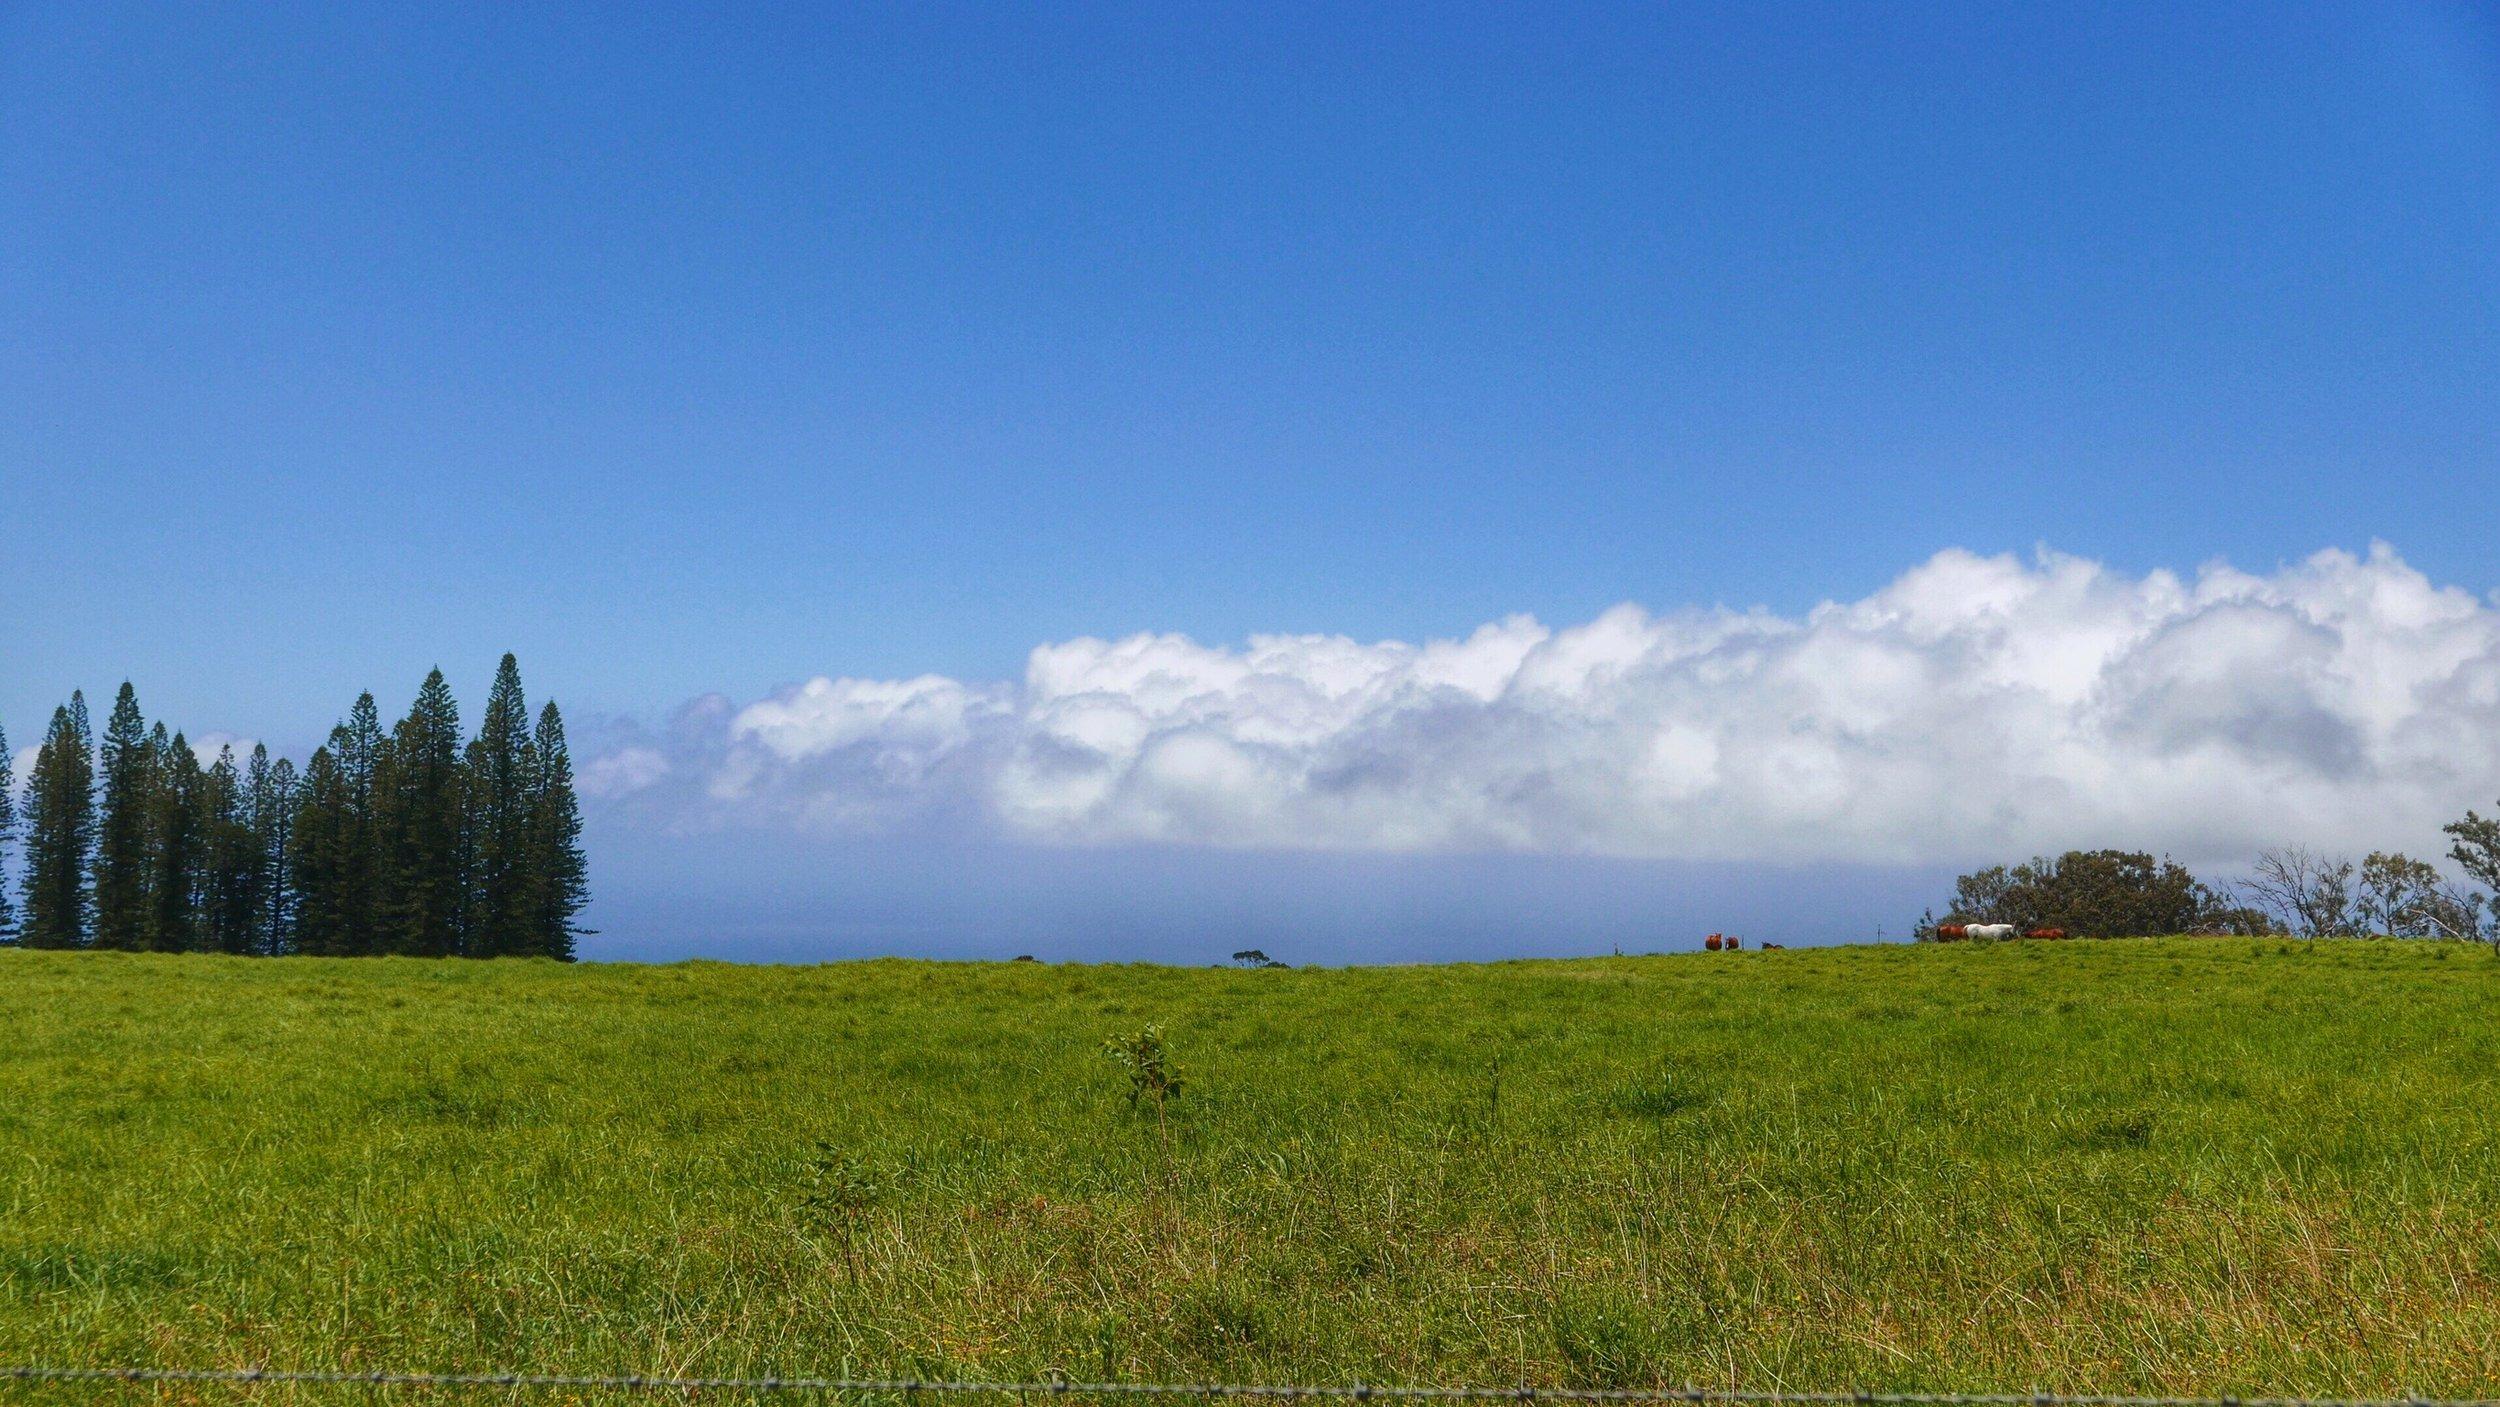 clouds-maui-hawaii.jpg